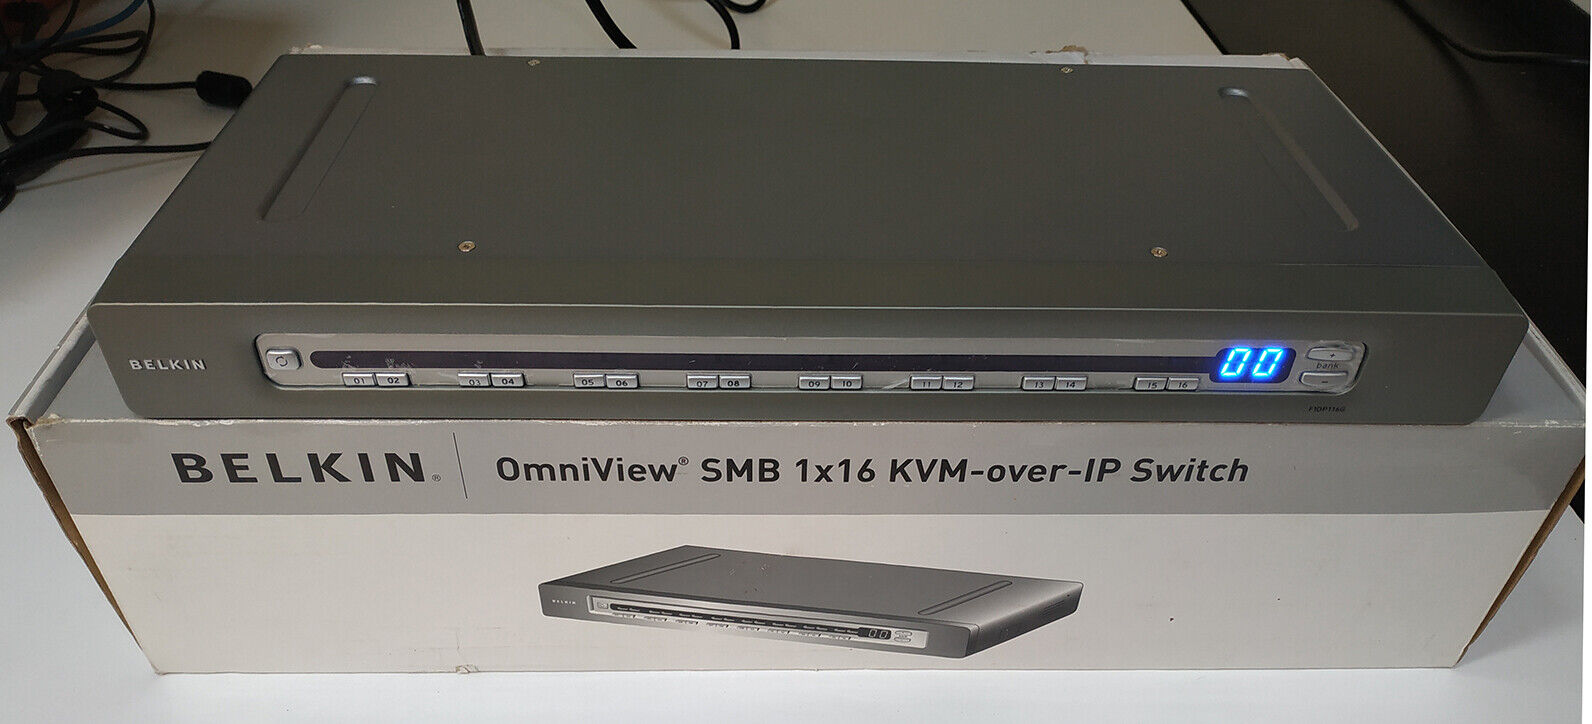 Belkin F1DP116G OmniView 1x16 SMB KVM Over IP Switch 16 Ports Cat5 1U Stackable